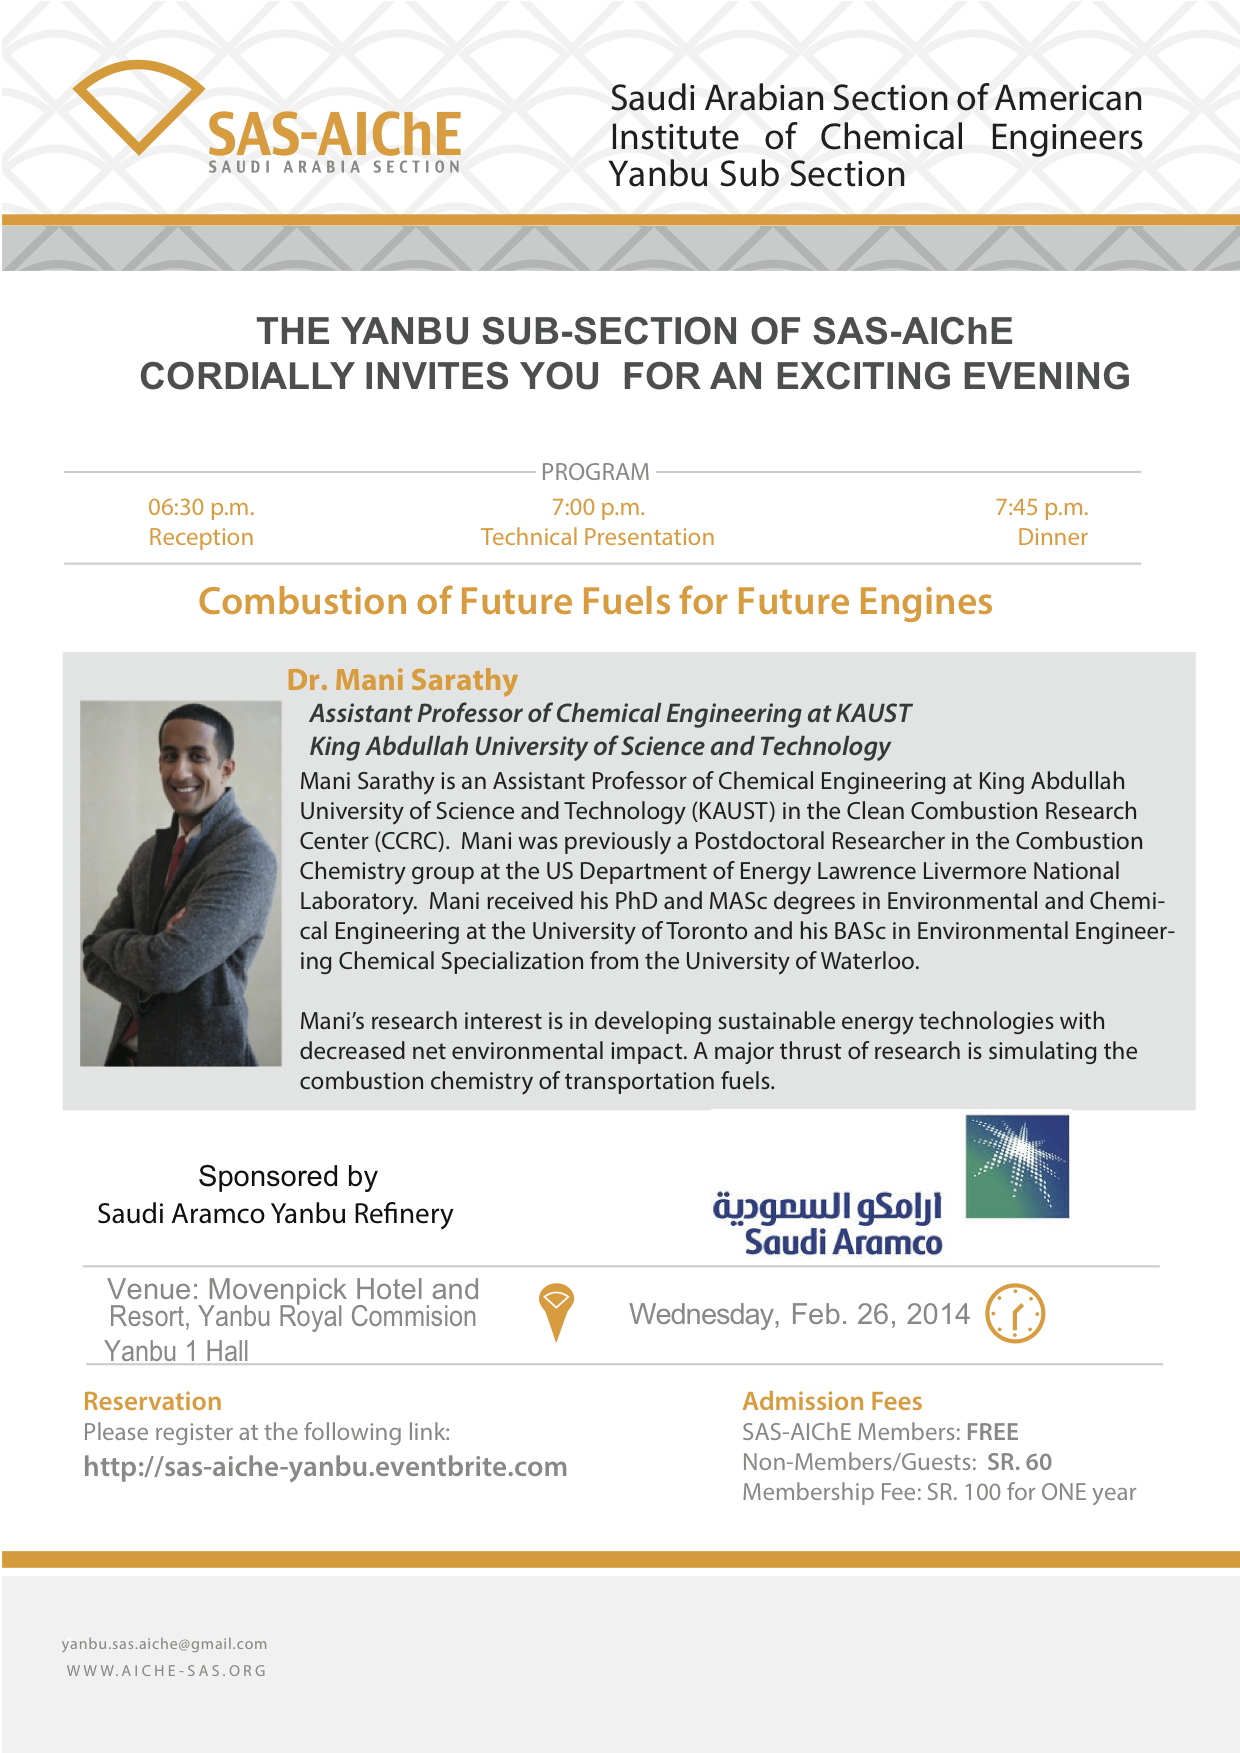 sas-aiche yanbu event dr. mani sarathy kaust